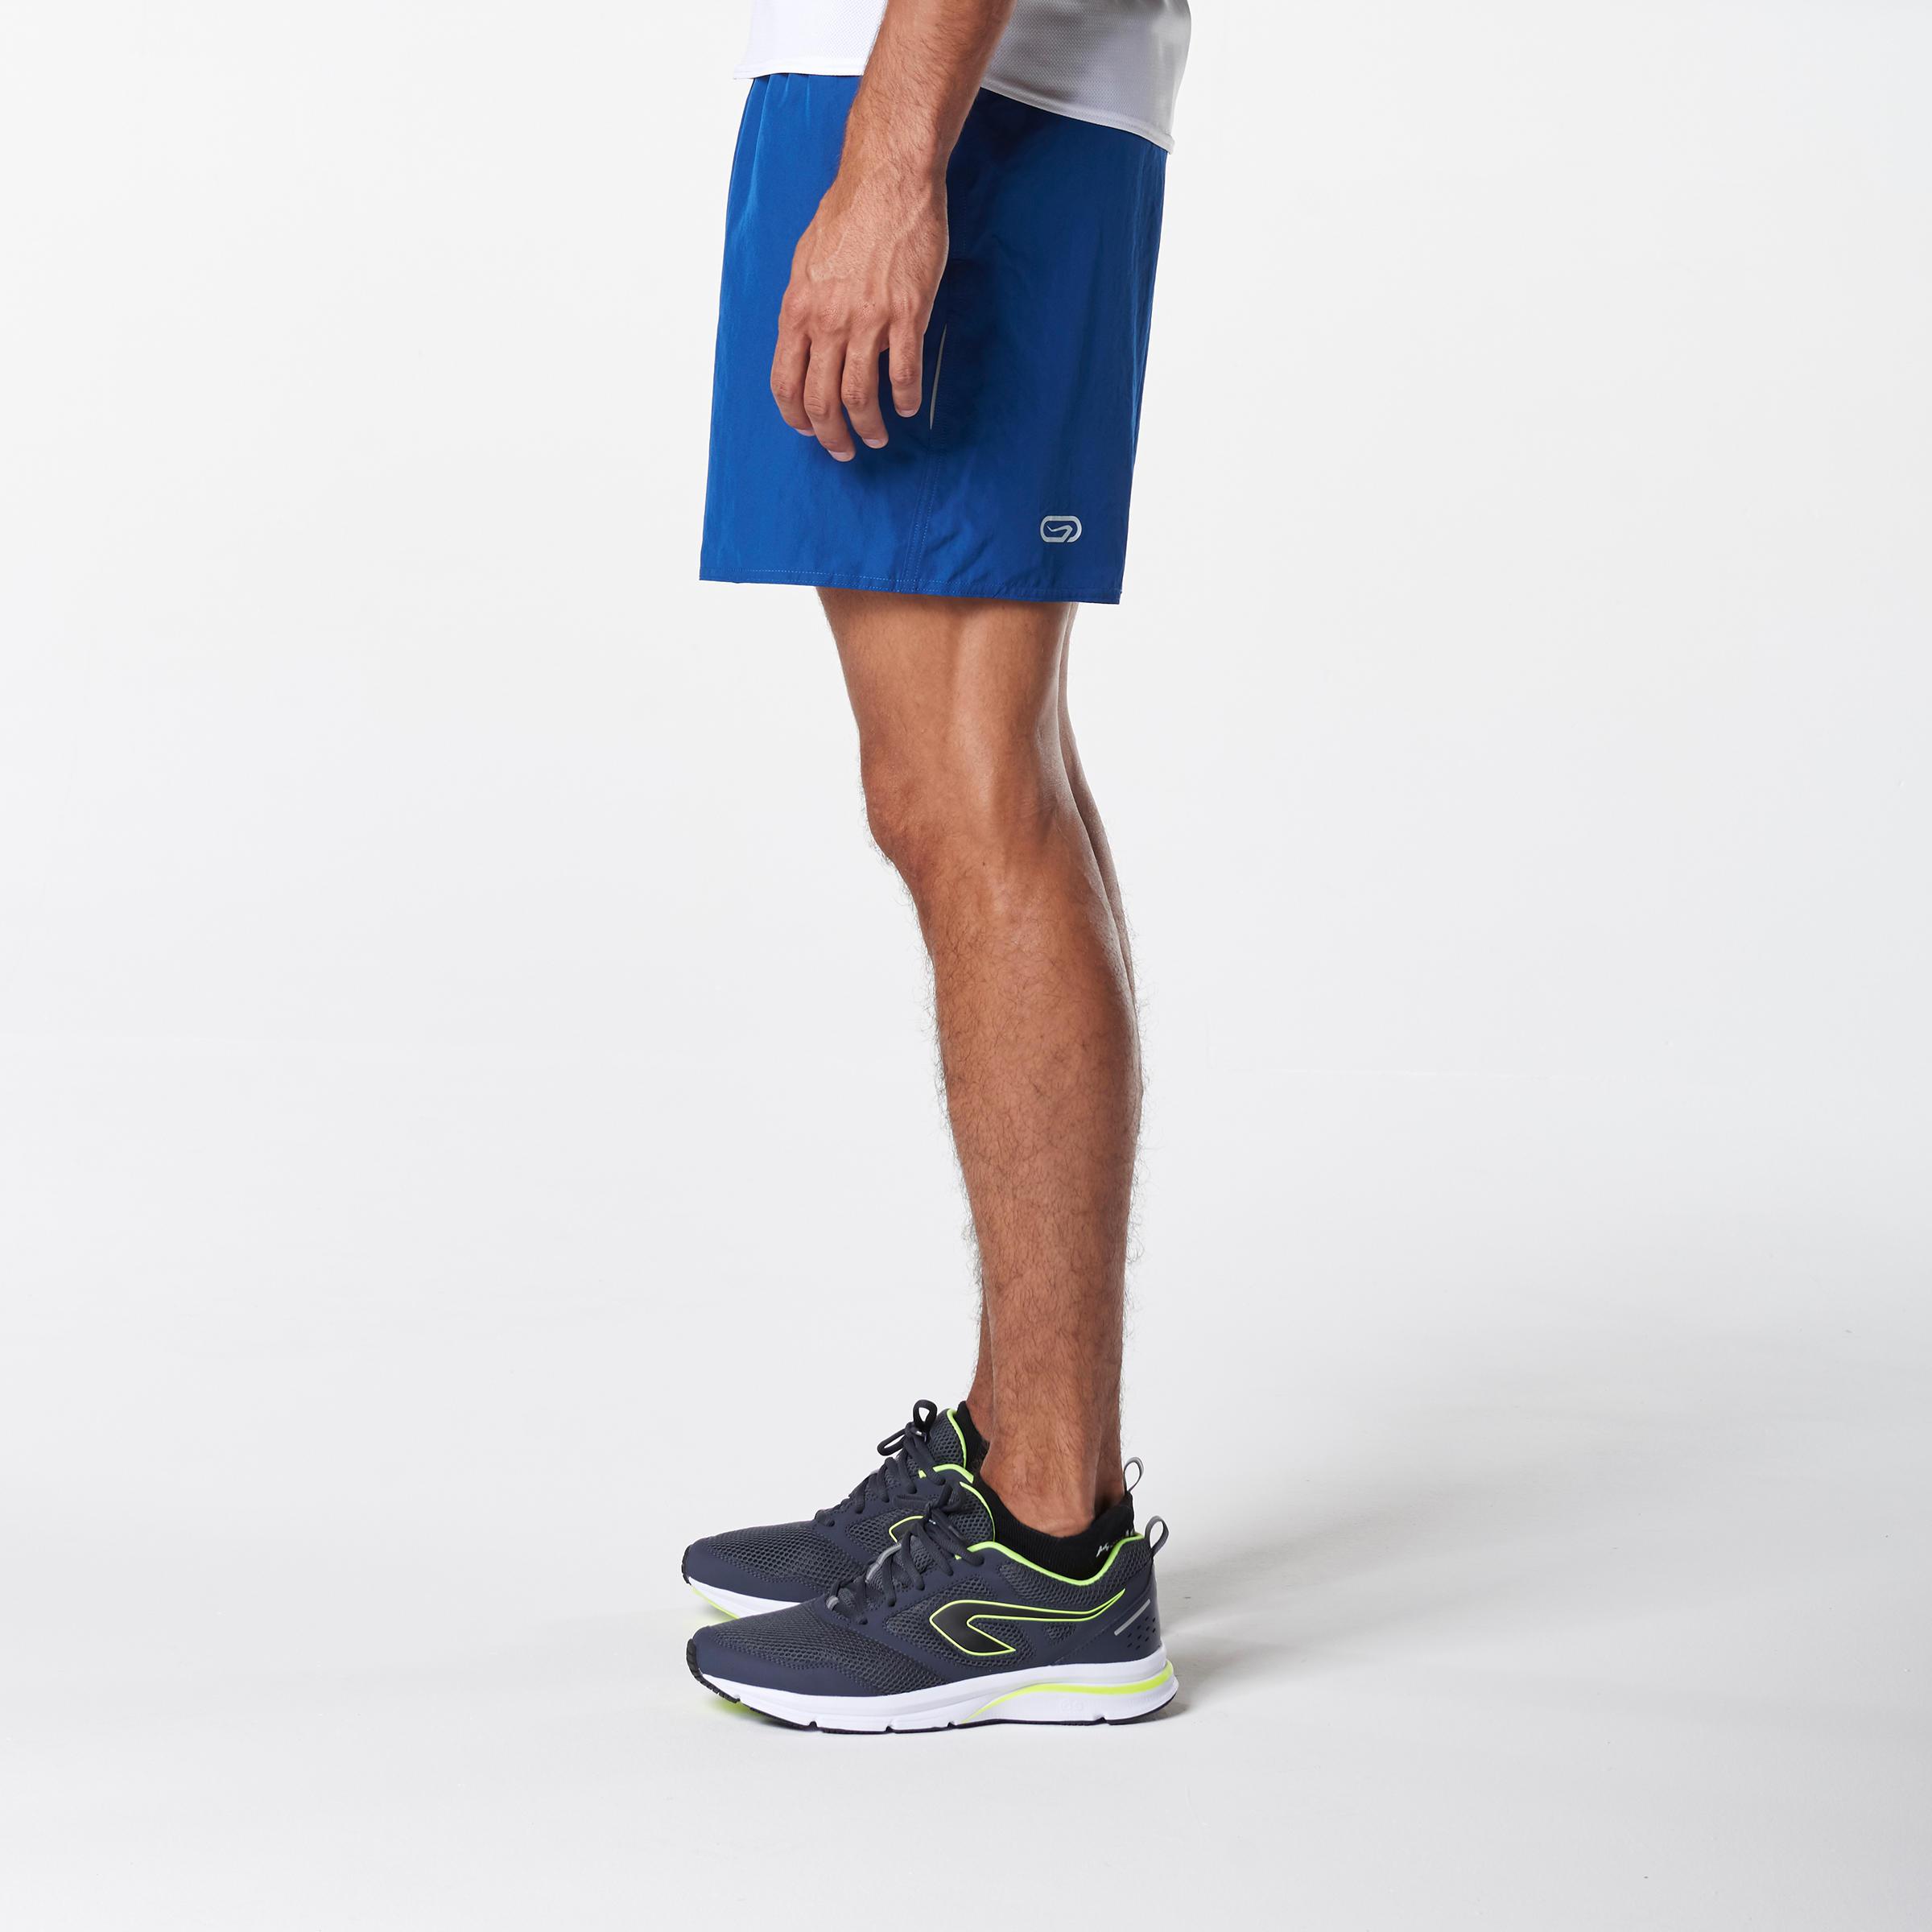 RUN DRY MEN'S RUNNING SHORTS BLUE